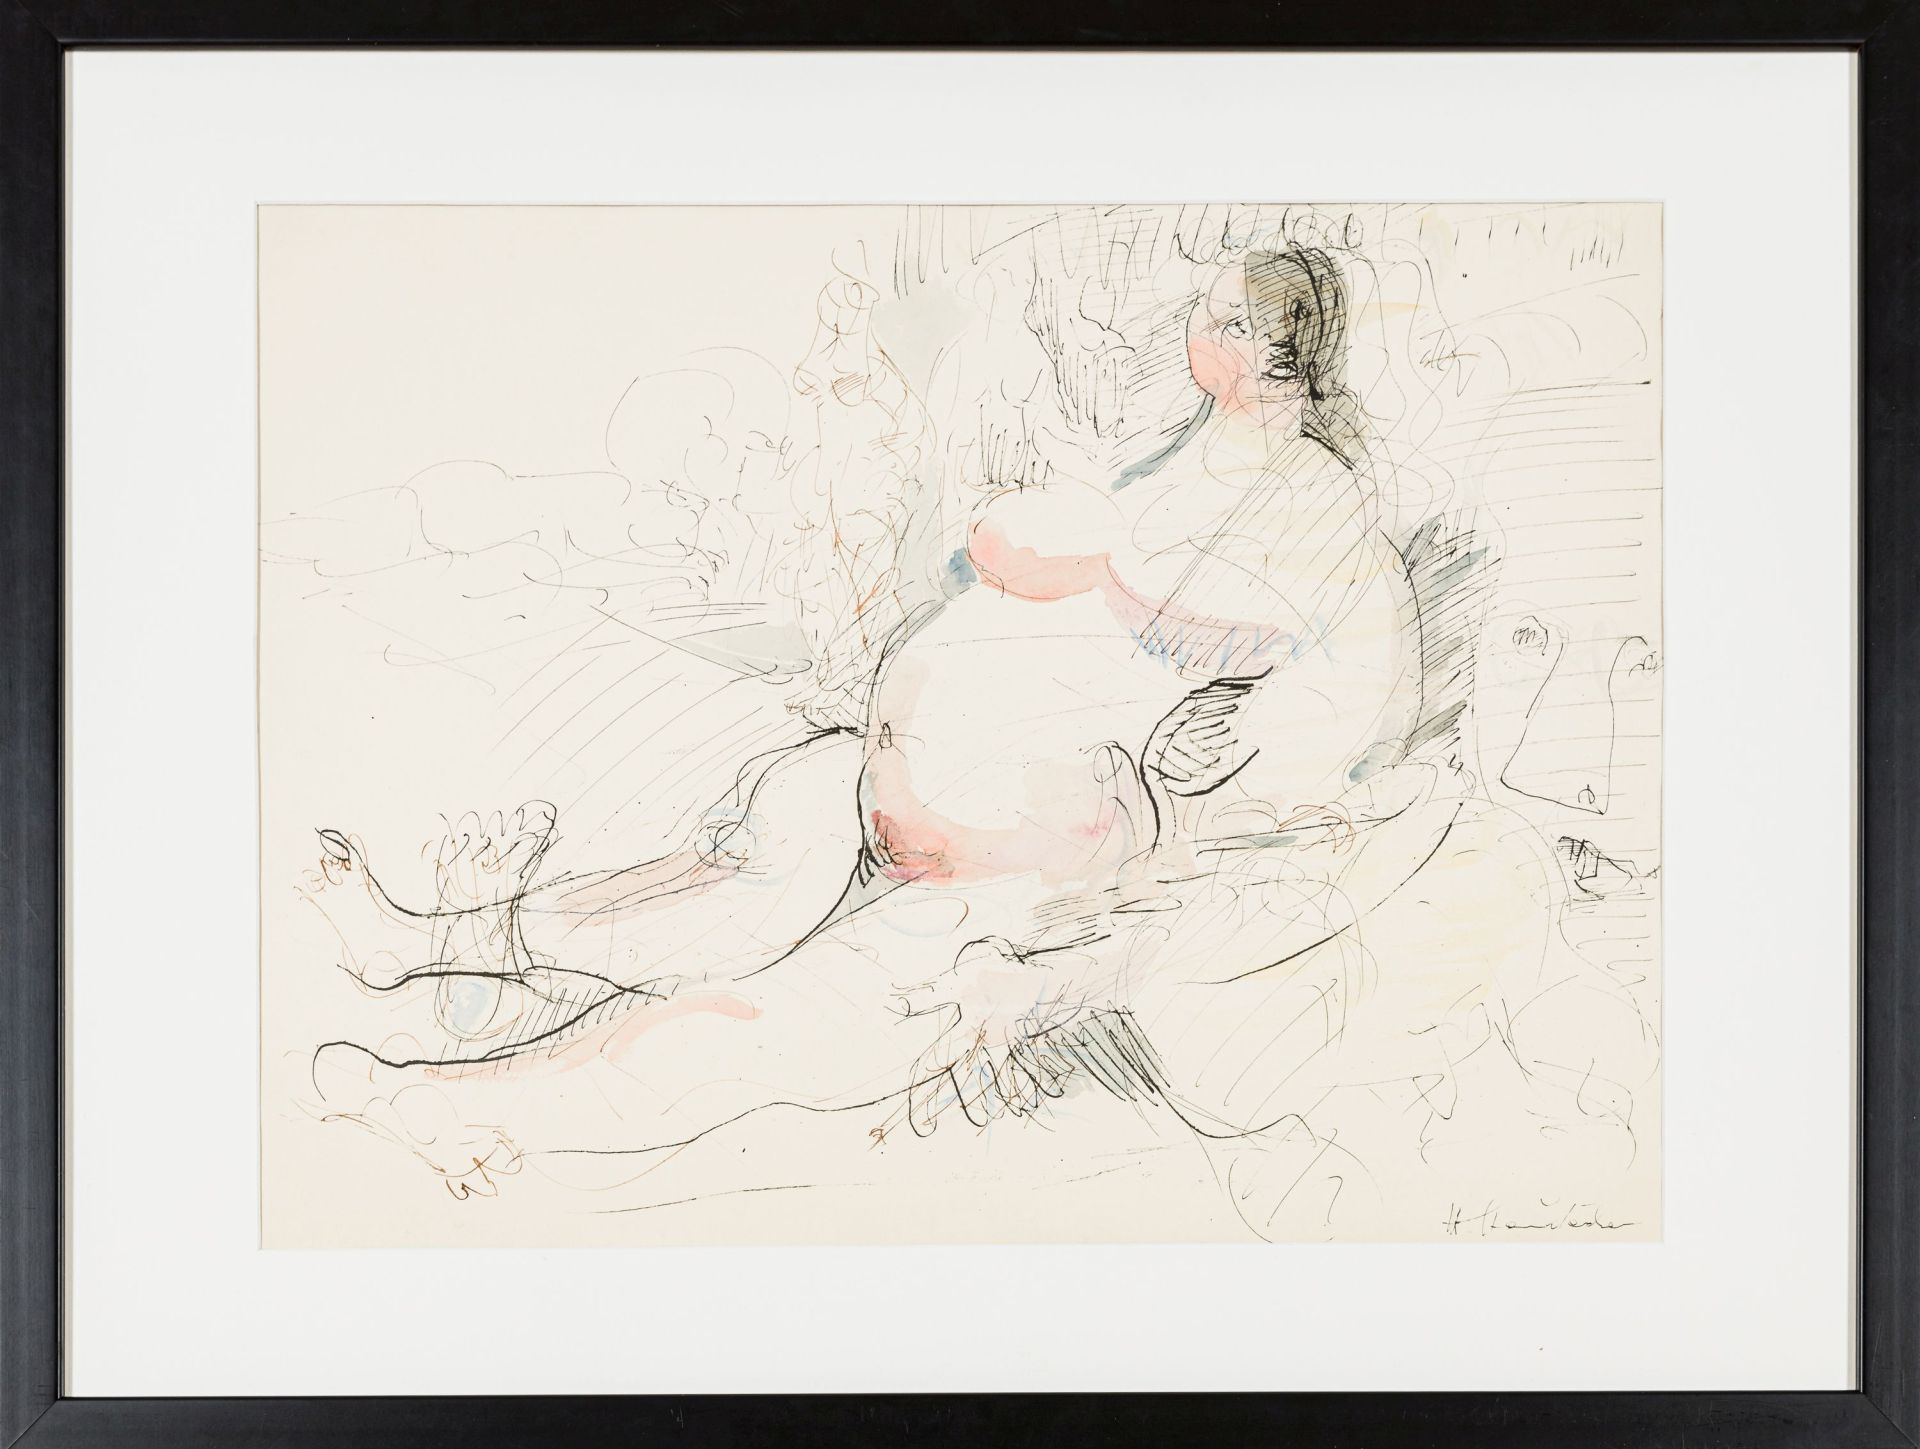 Hans Staudacher-Fat lady